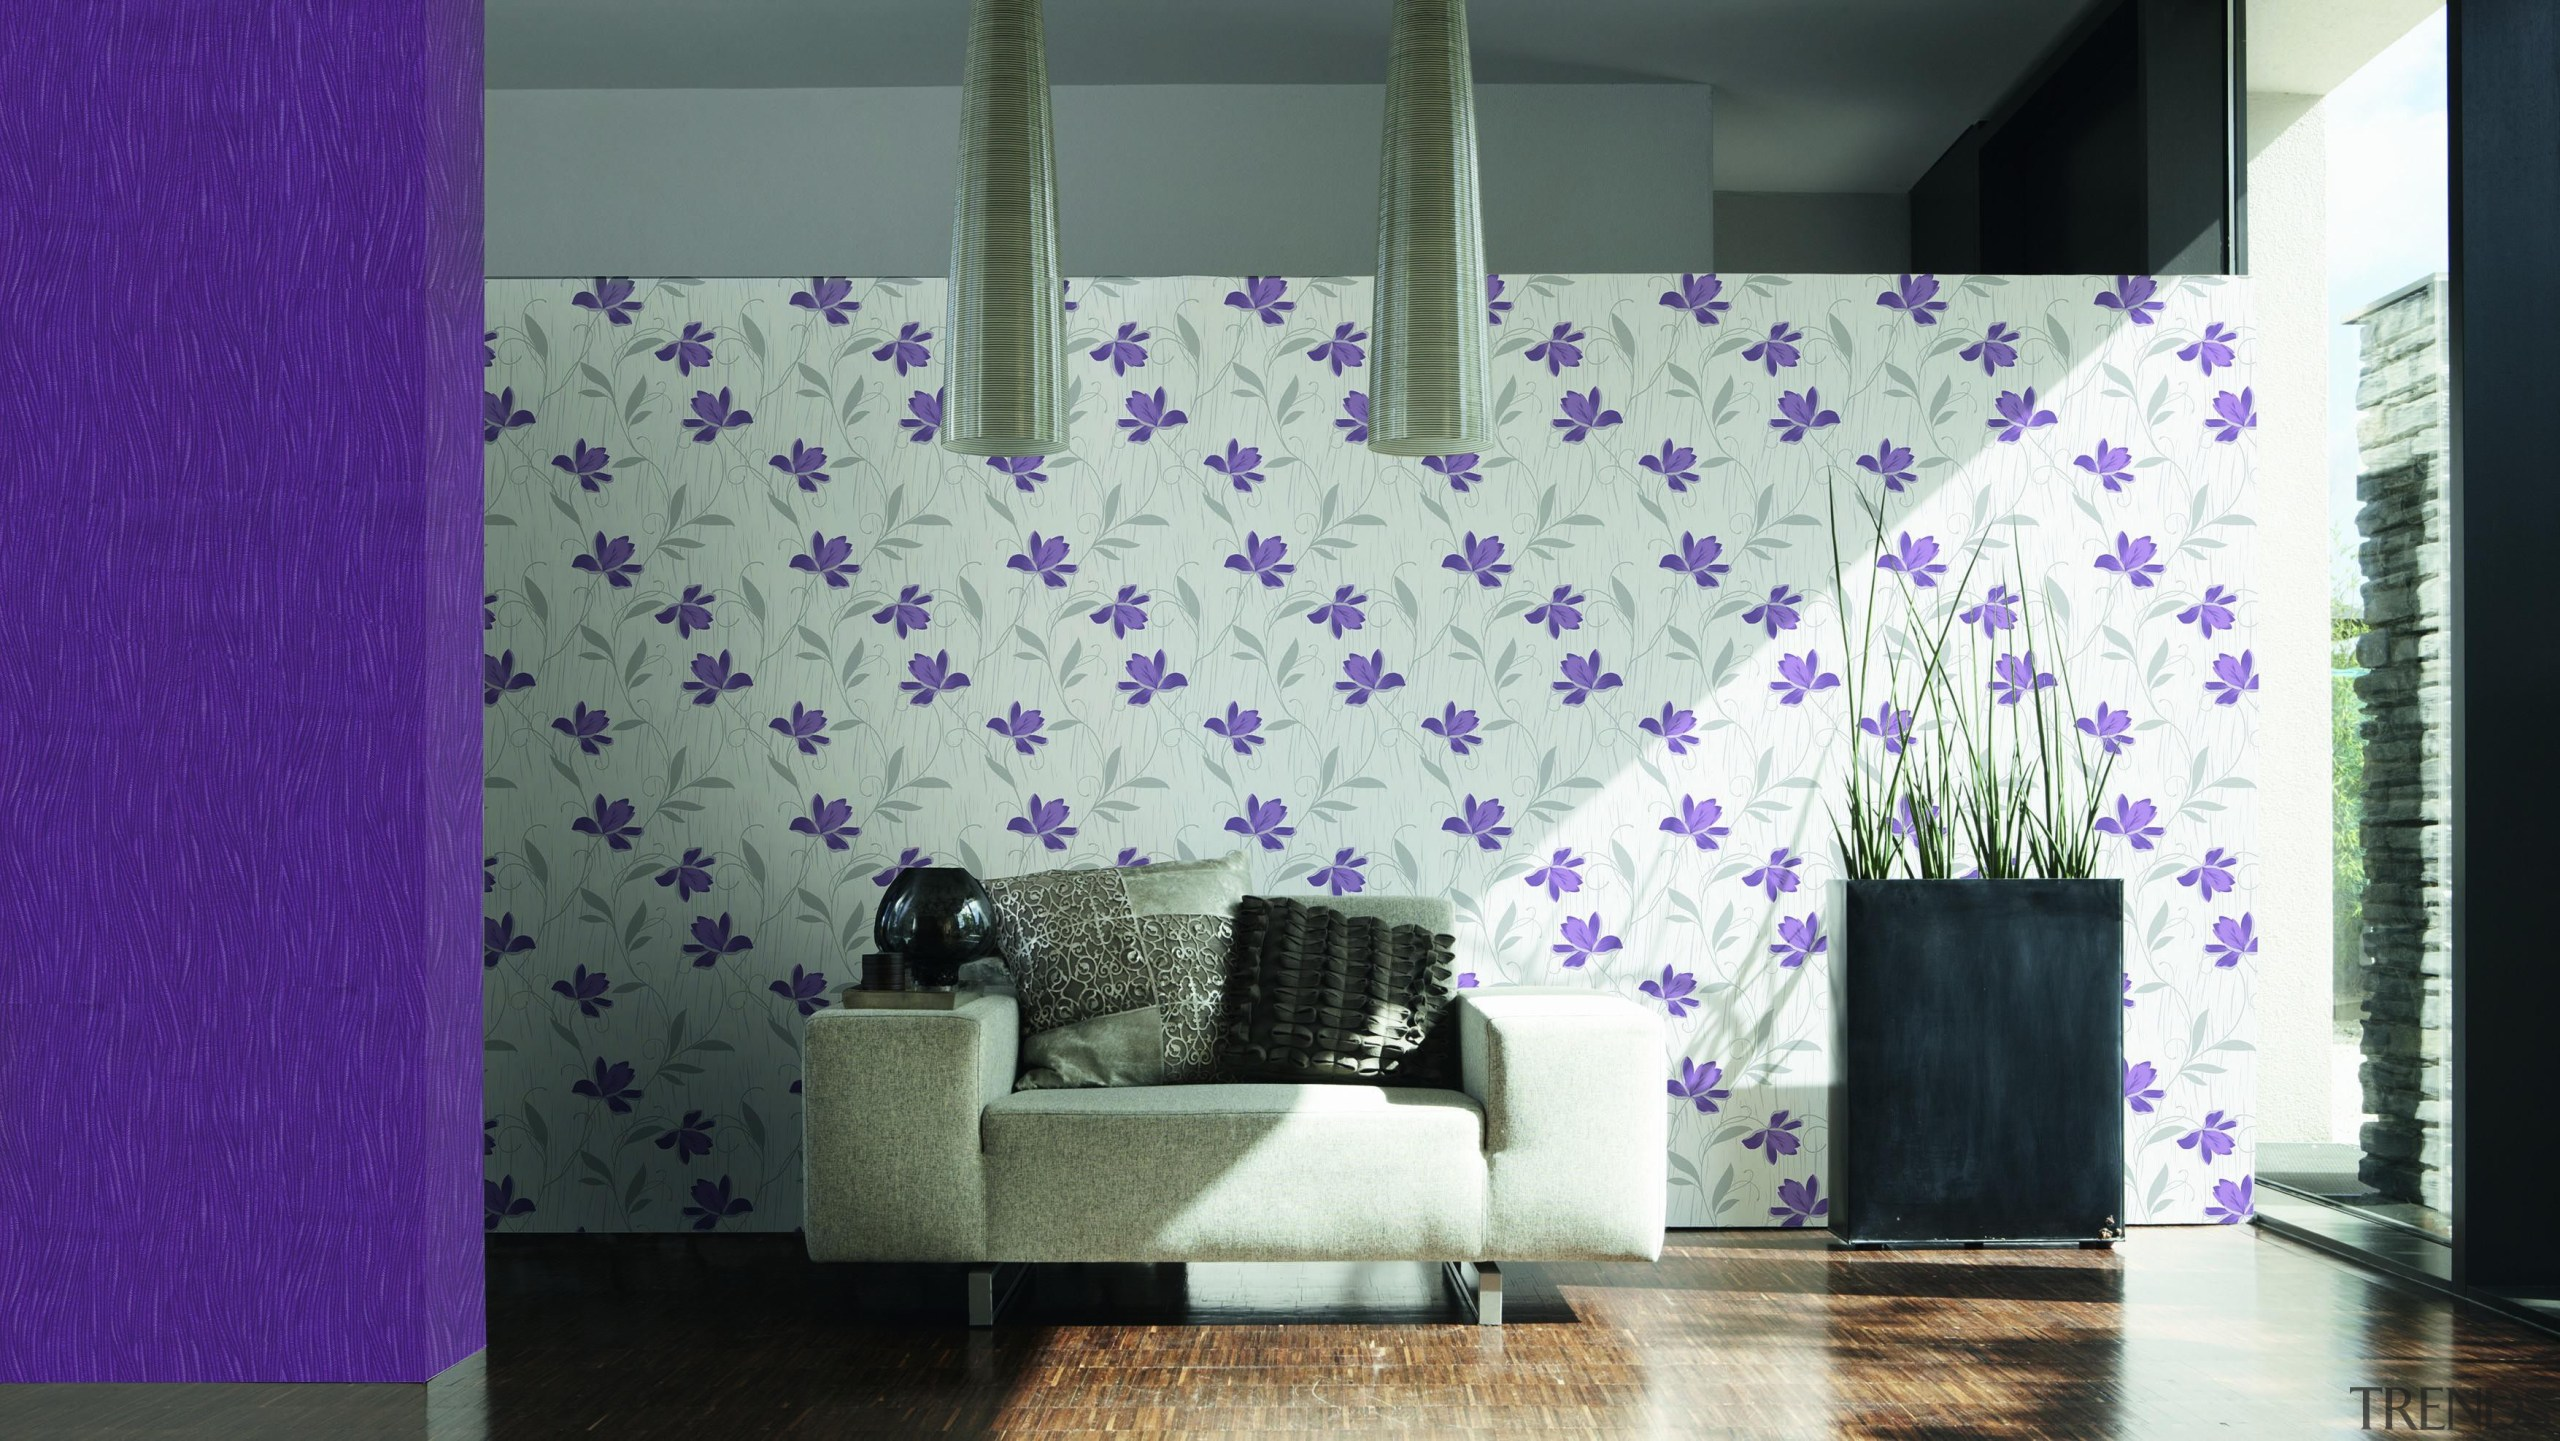 Chicago Range - Chicago Range - architecture | architecture, ceiling, flooring, interior design, pattern, purple, textile, wall, wallpaper, window, white